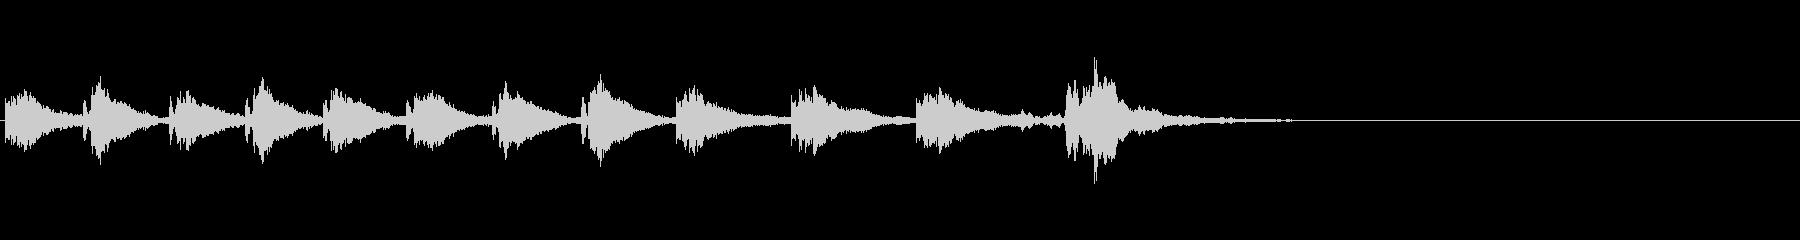 KANT和風太鼓効果音2の未再生の波形